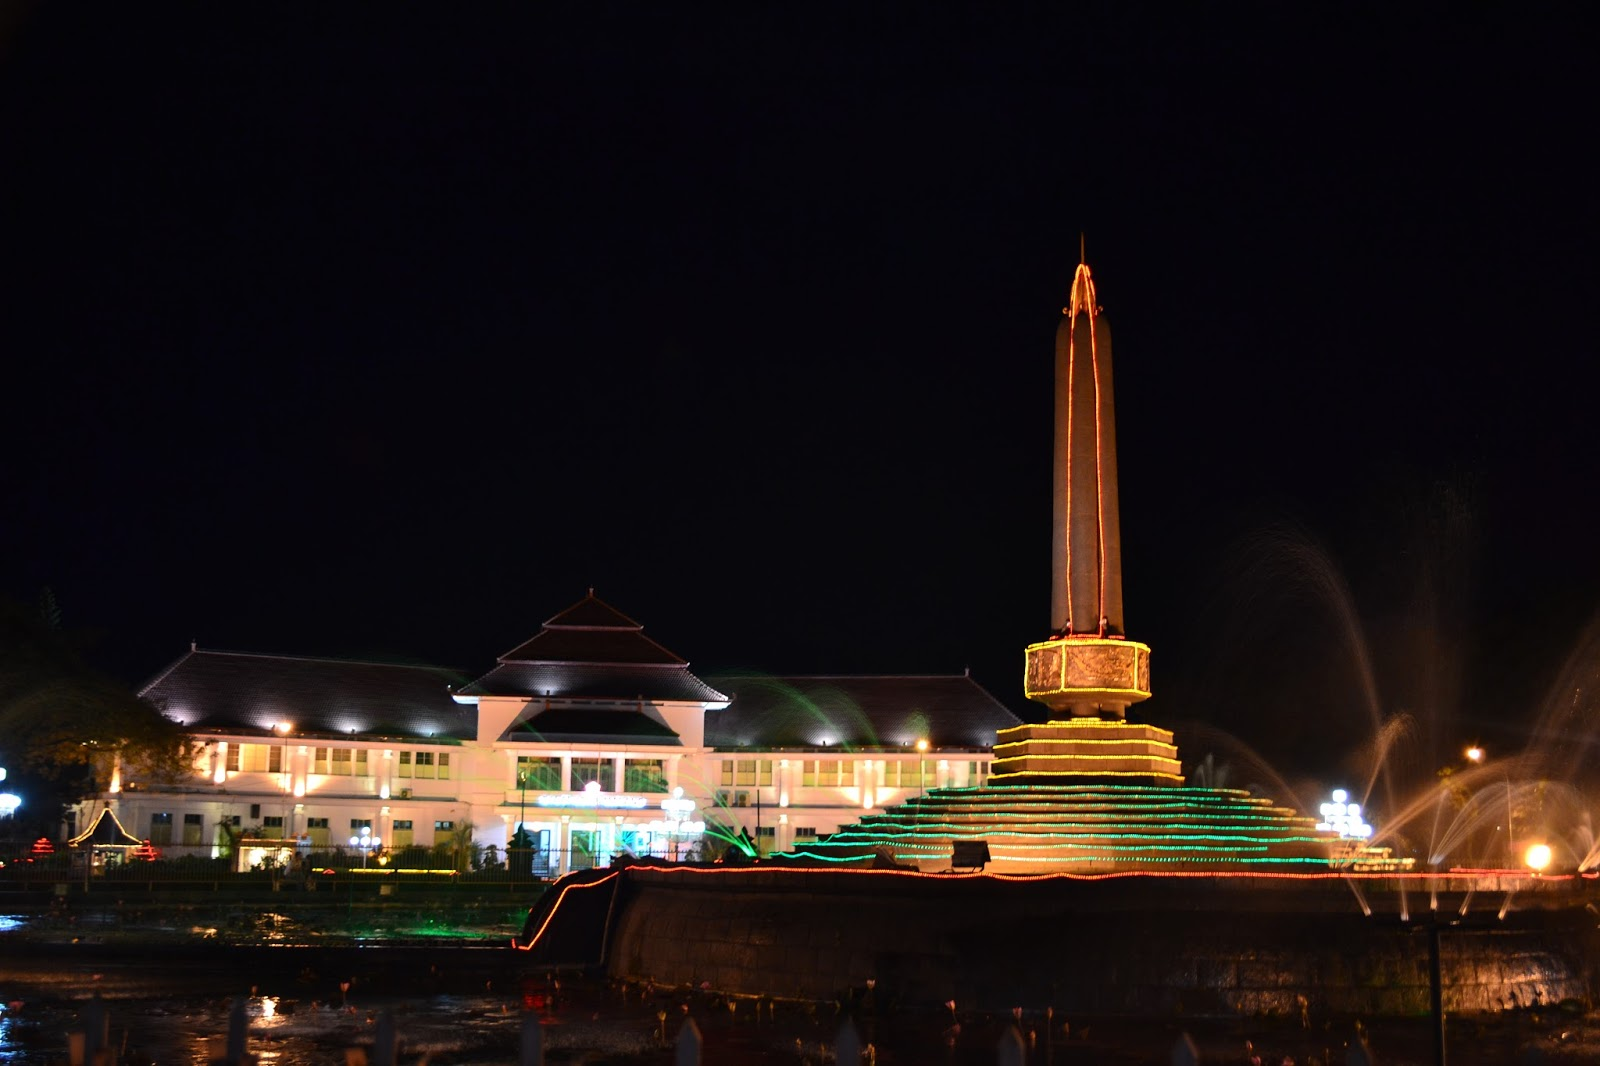 Daftar Nama Tempat Wisata Kota Malang Bukan Sekedar Blog Alun